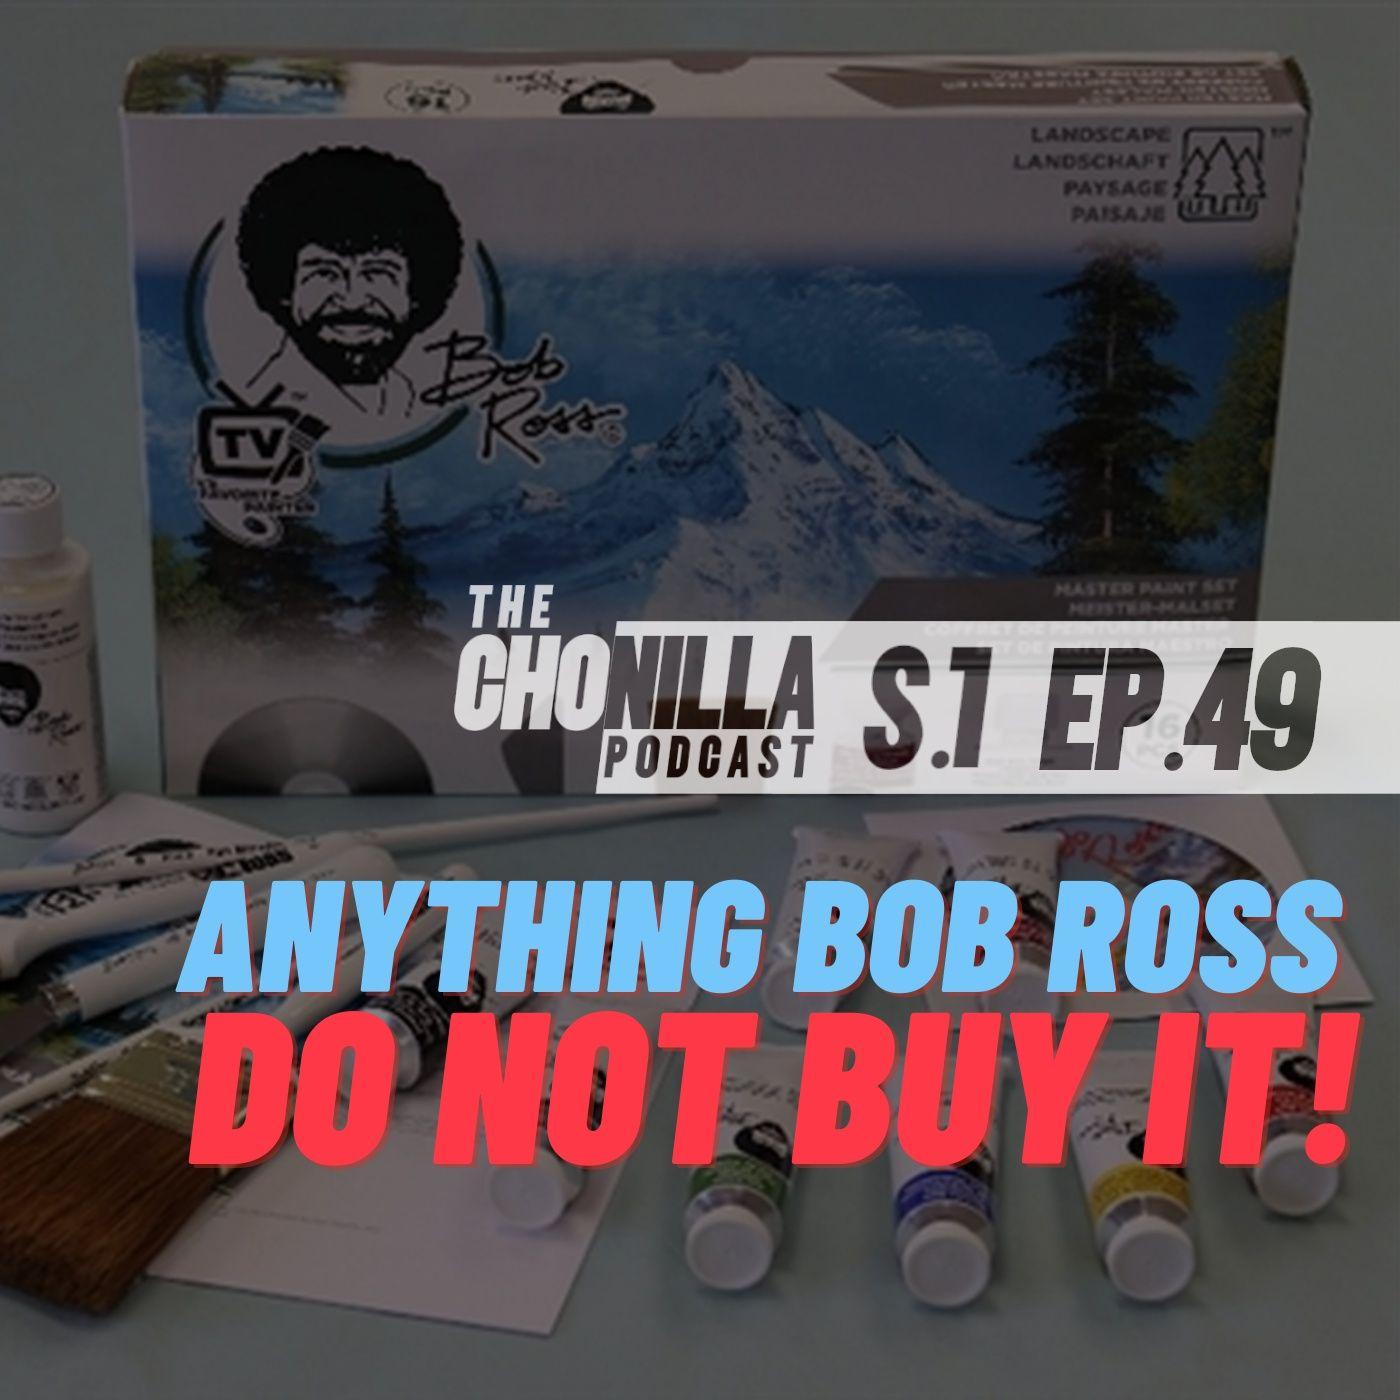 Anything Bob Ross Do Not Buy It!